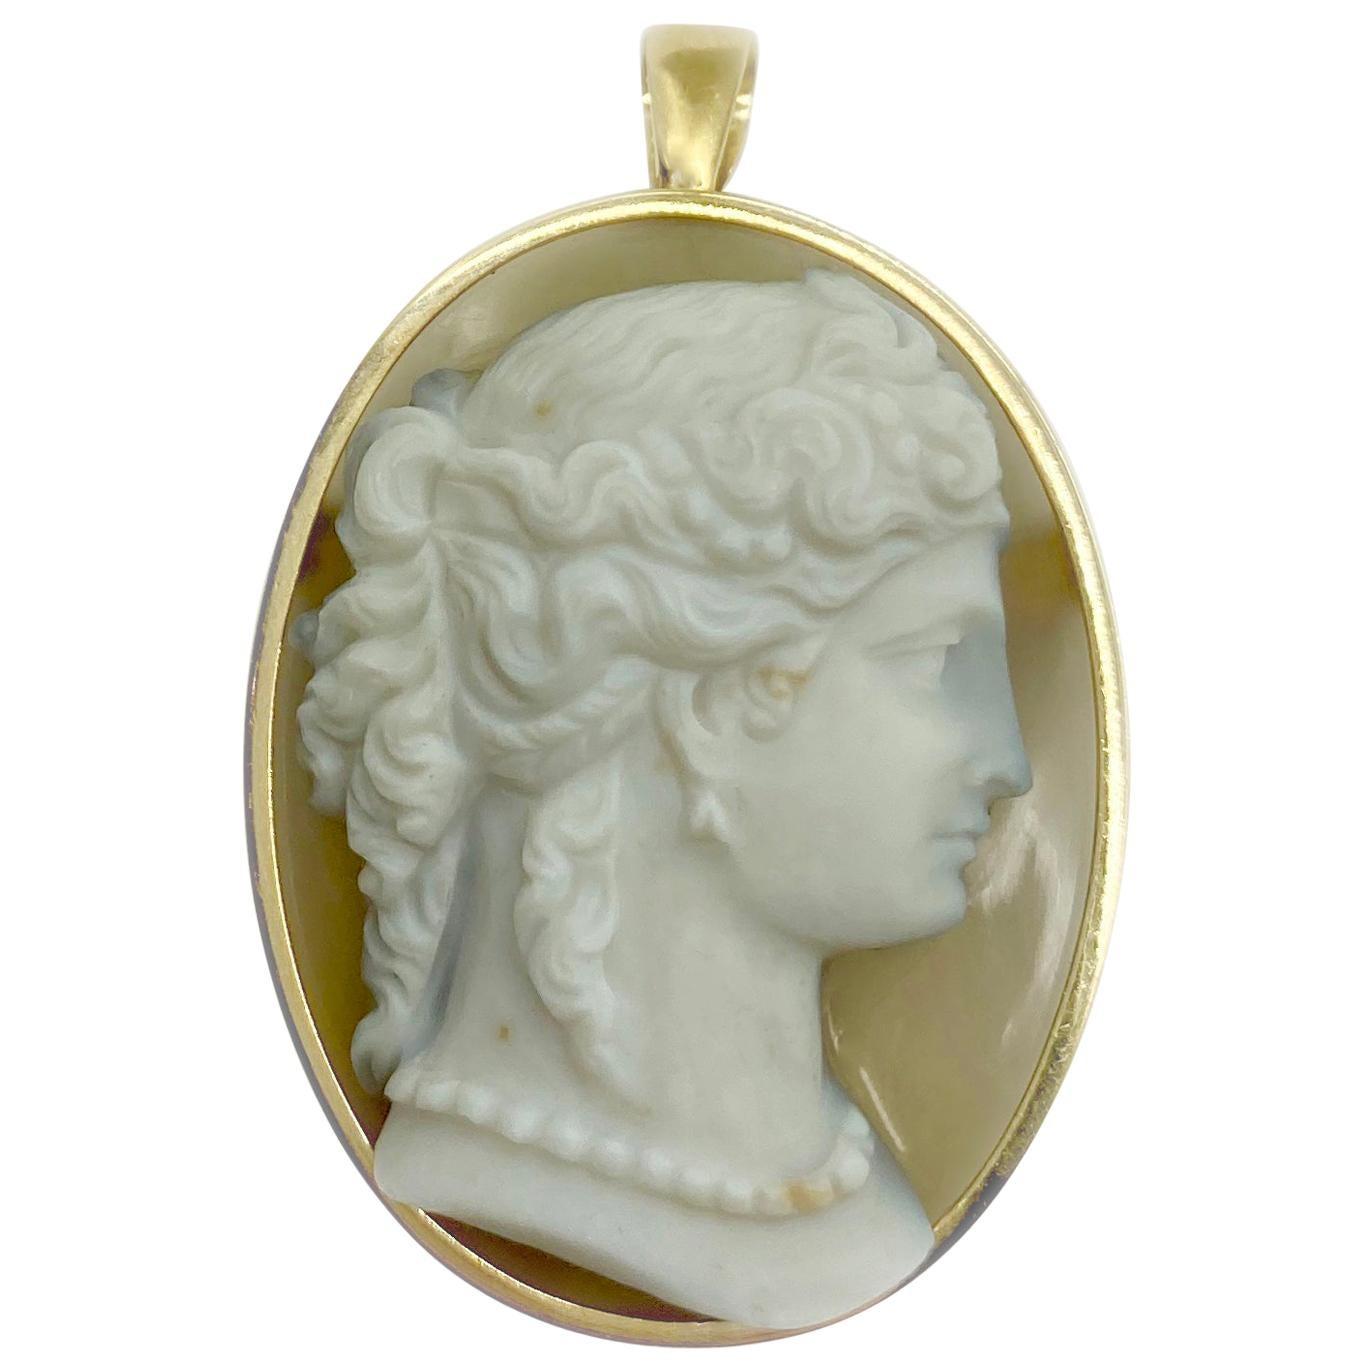 Antique Agate Cameo Pendant Brooch